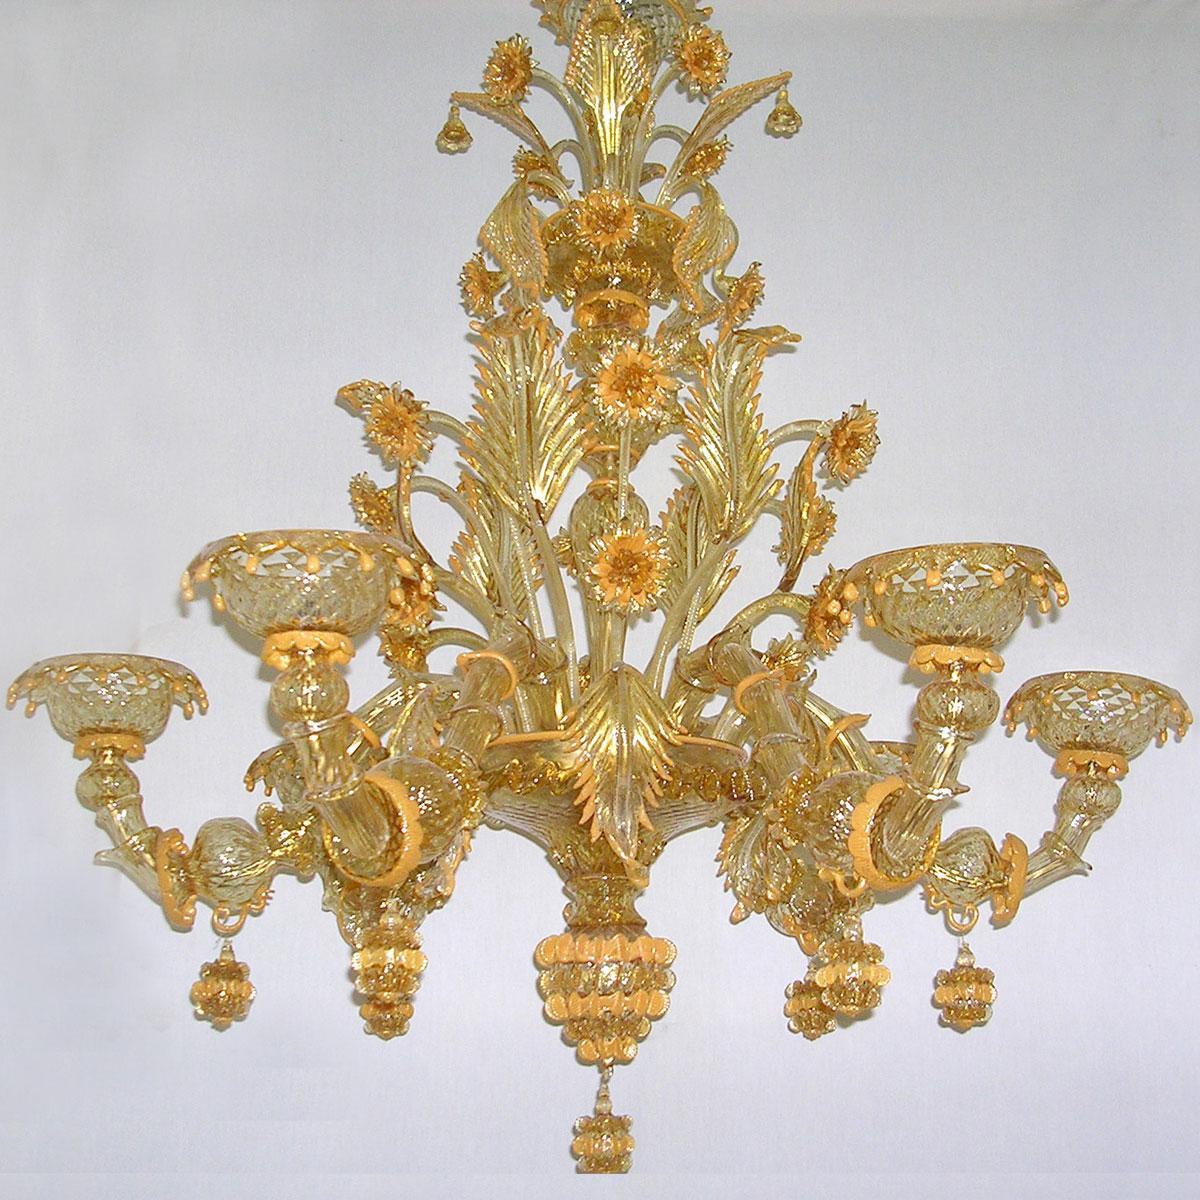 """Midna"" Murano glas Kronleuchter - 6 flammig - gold"